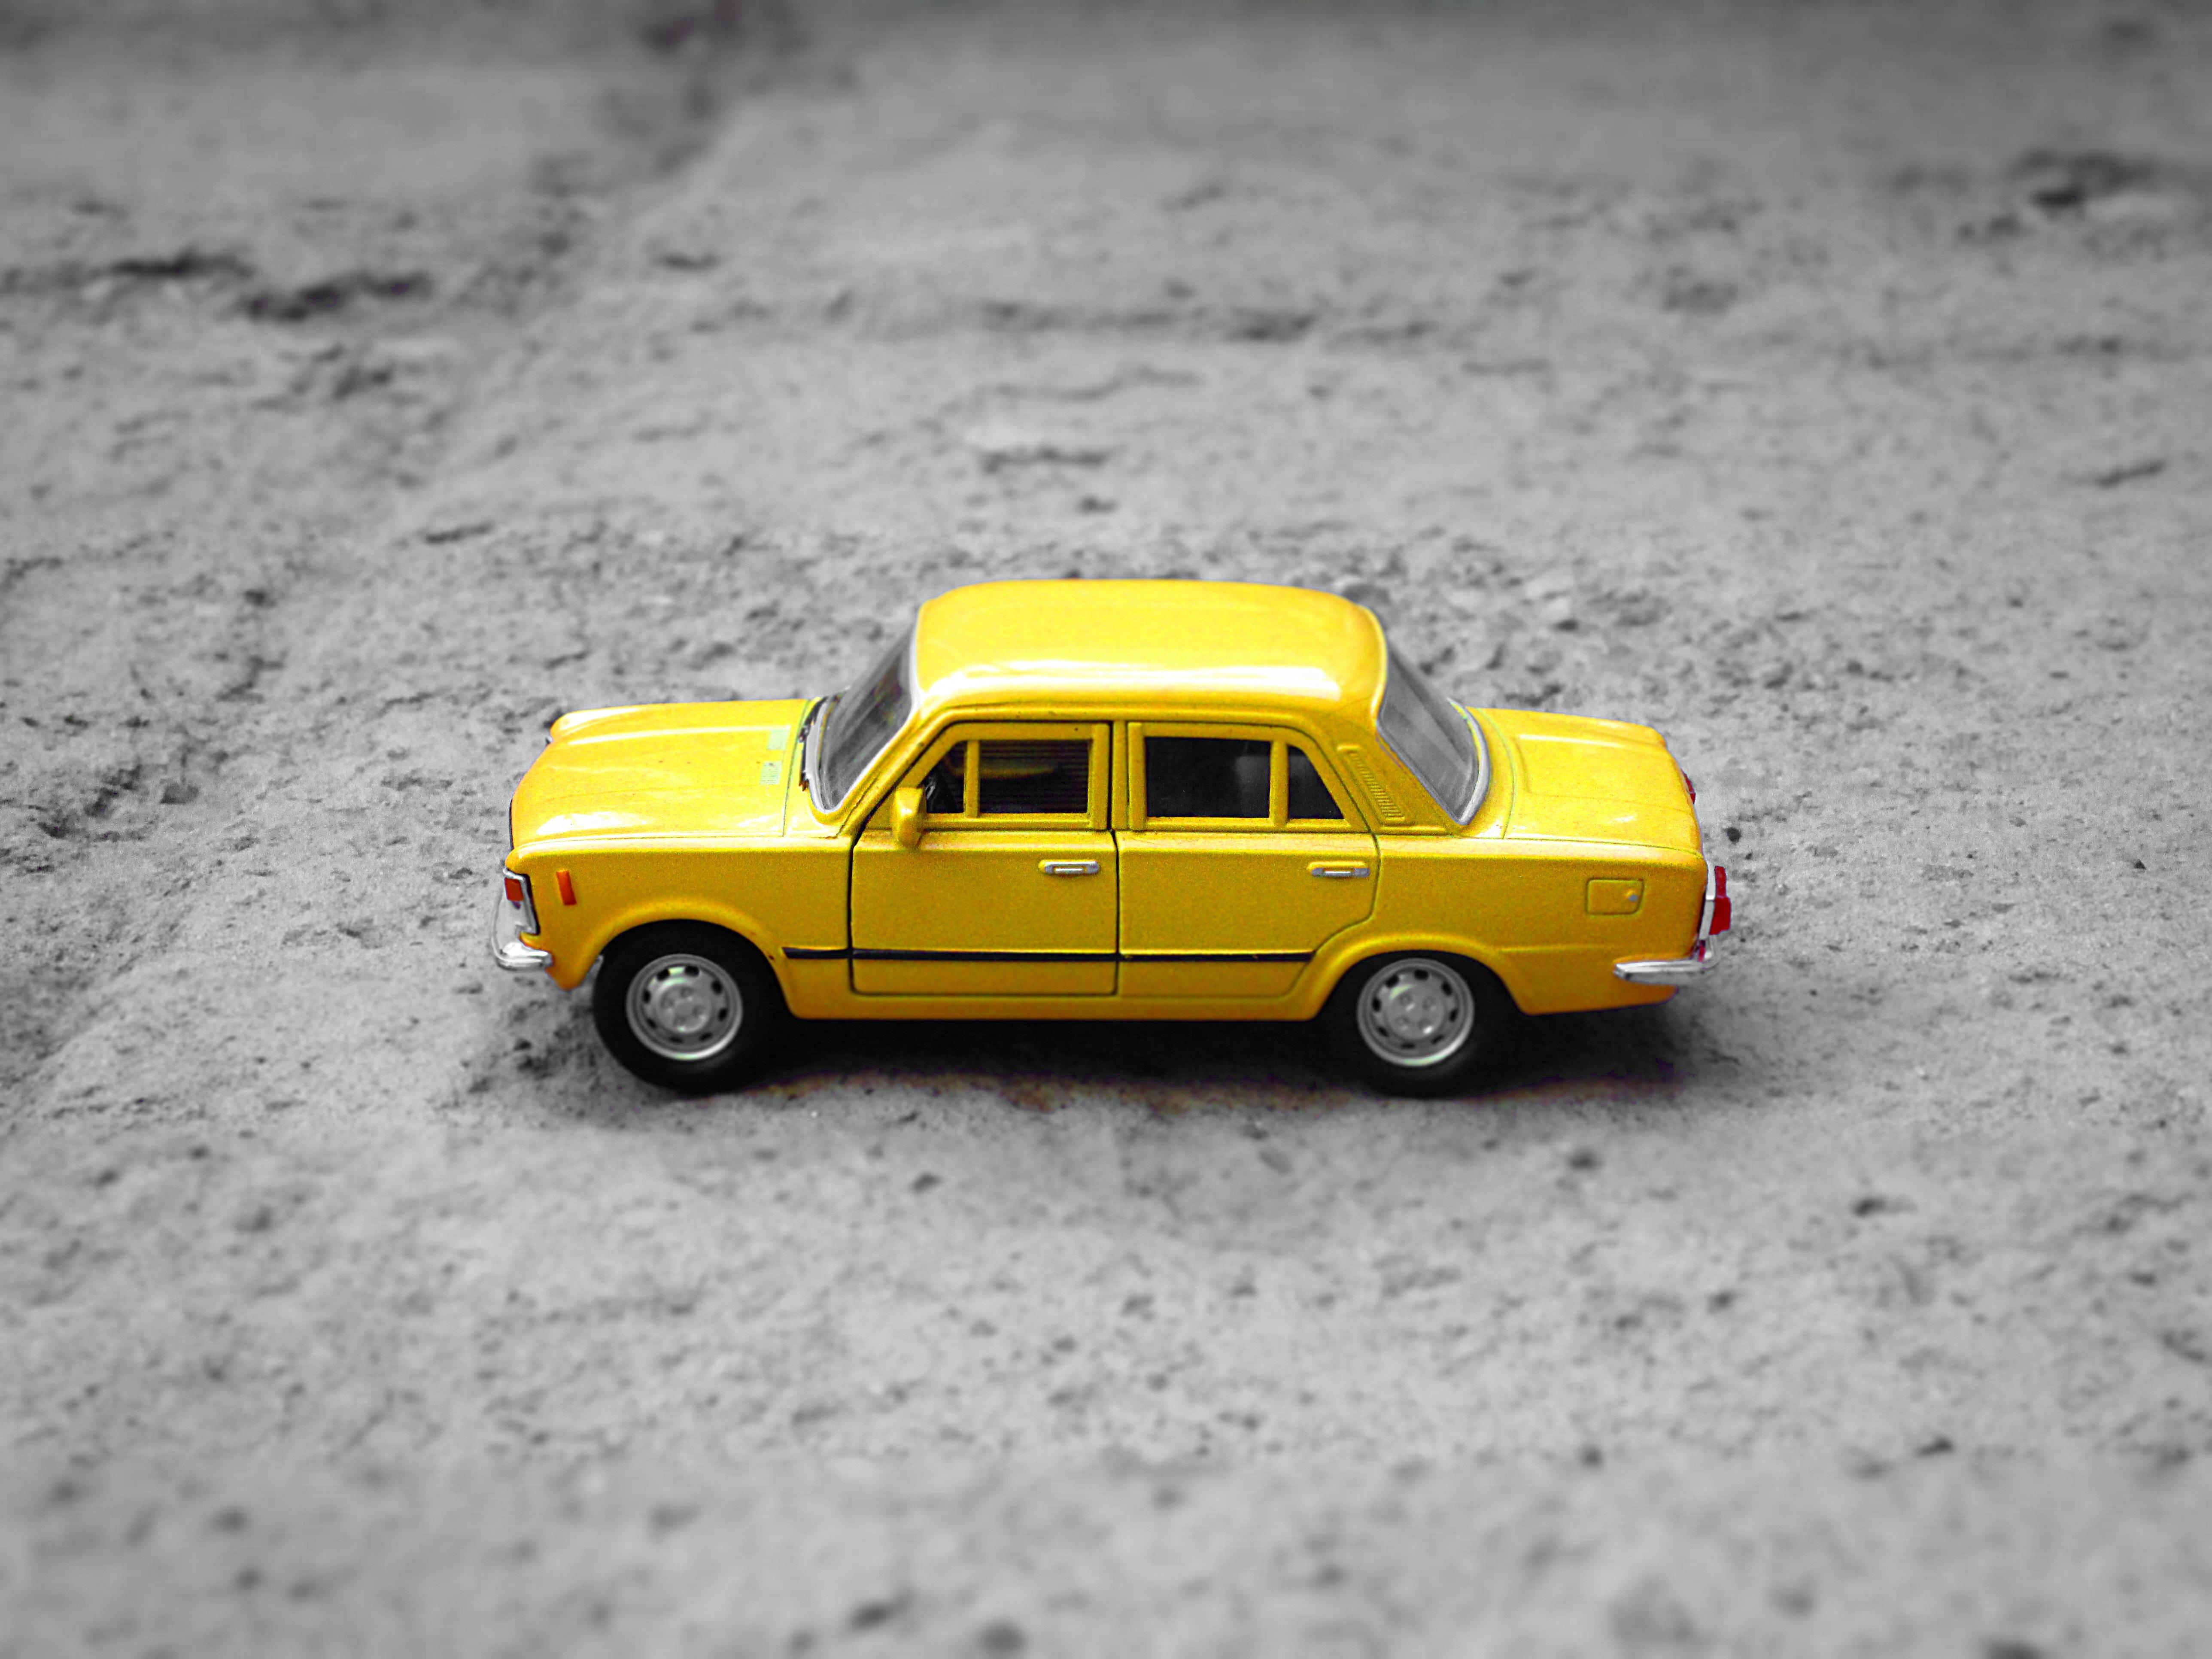 Miniature yellow toy taxi cab on sidewalk